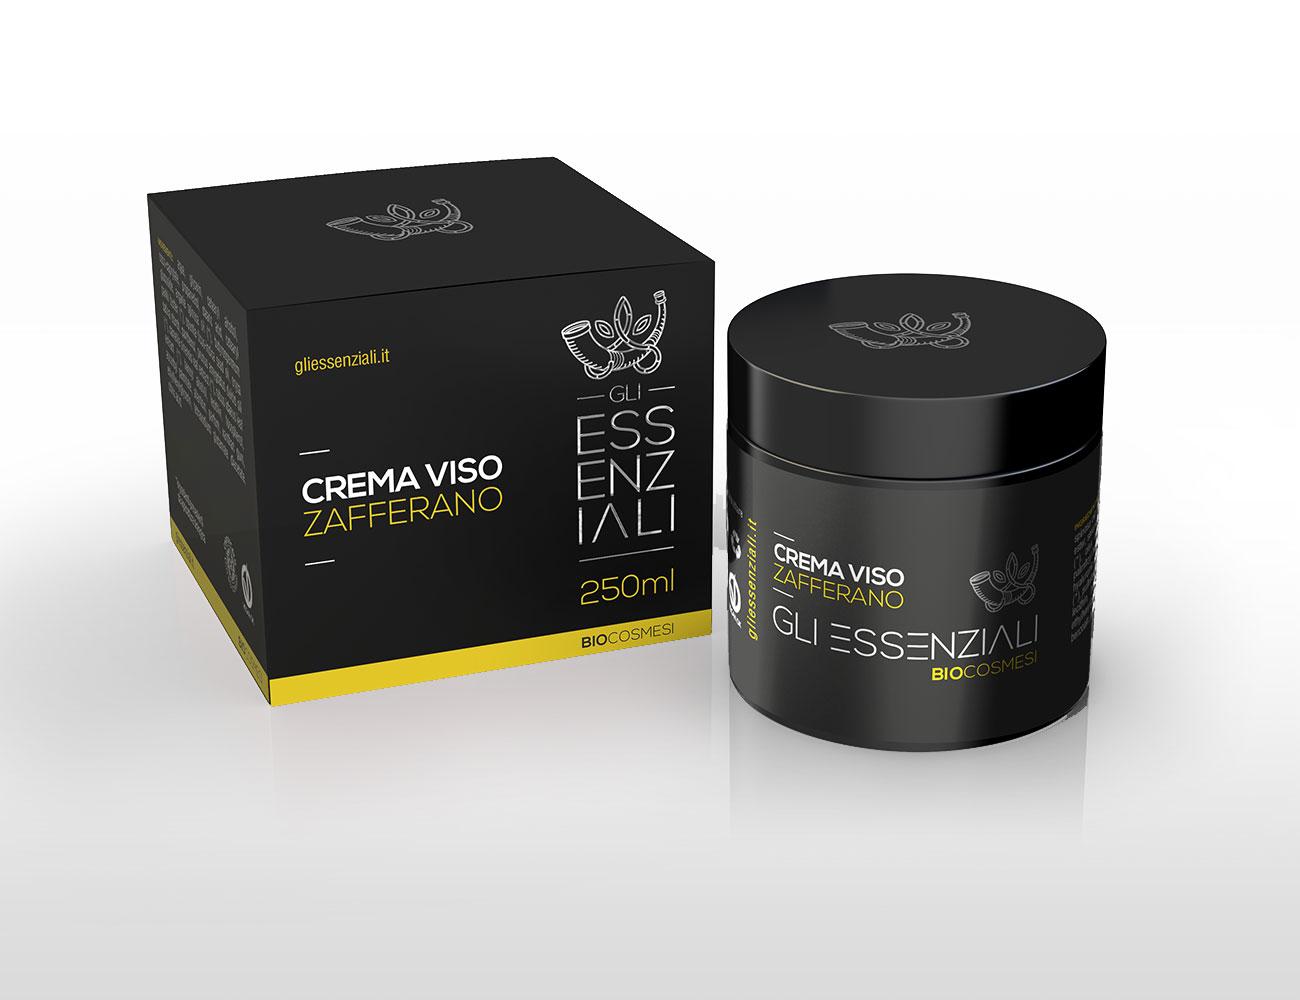 packaging-grafica-logo-gli-essenziali-cosmetica-digit81-simone-roveda-zafferano